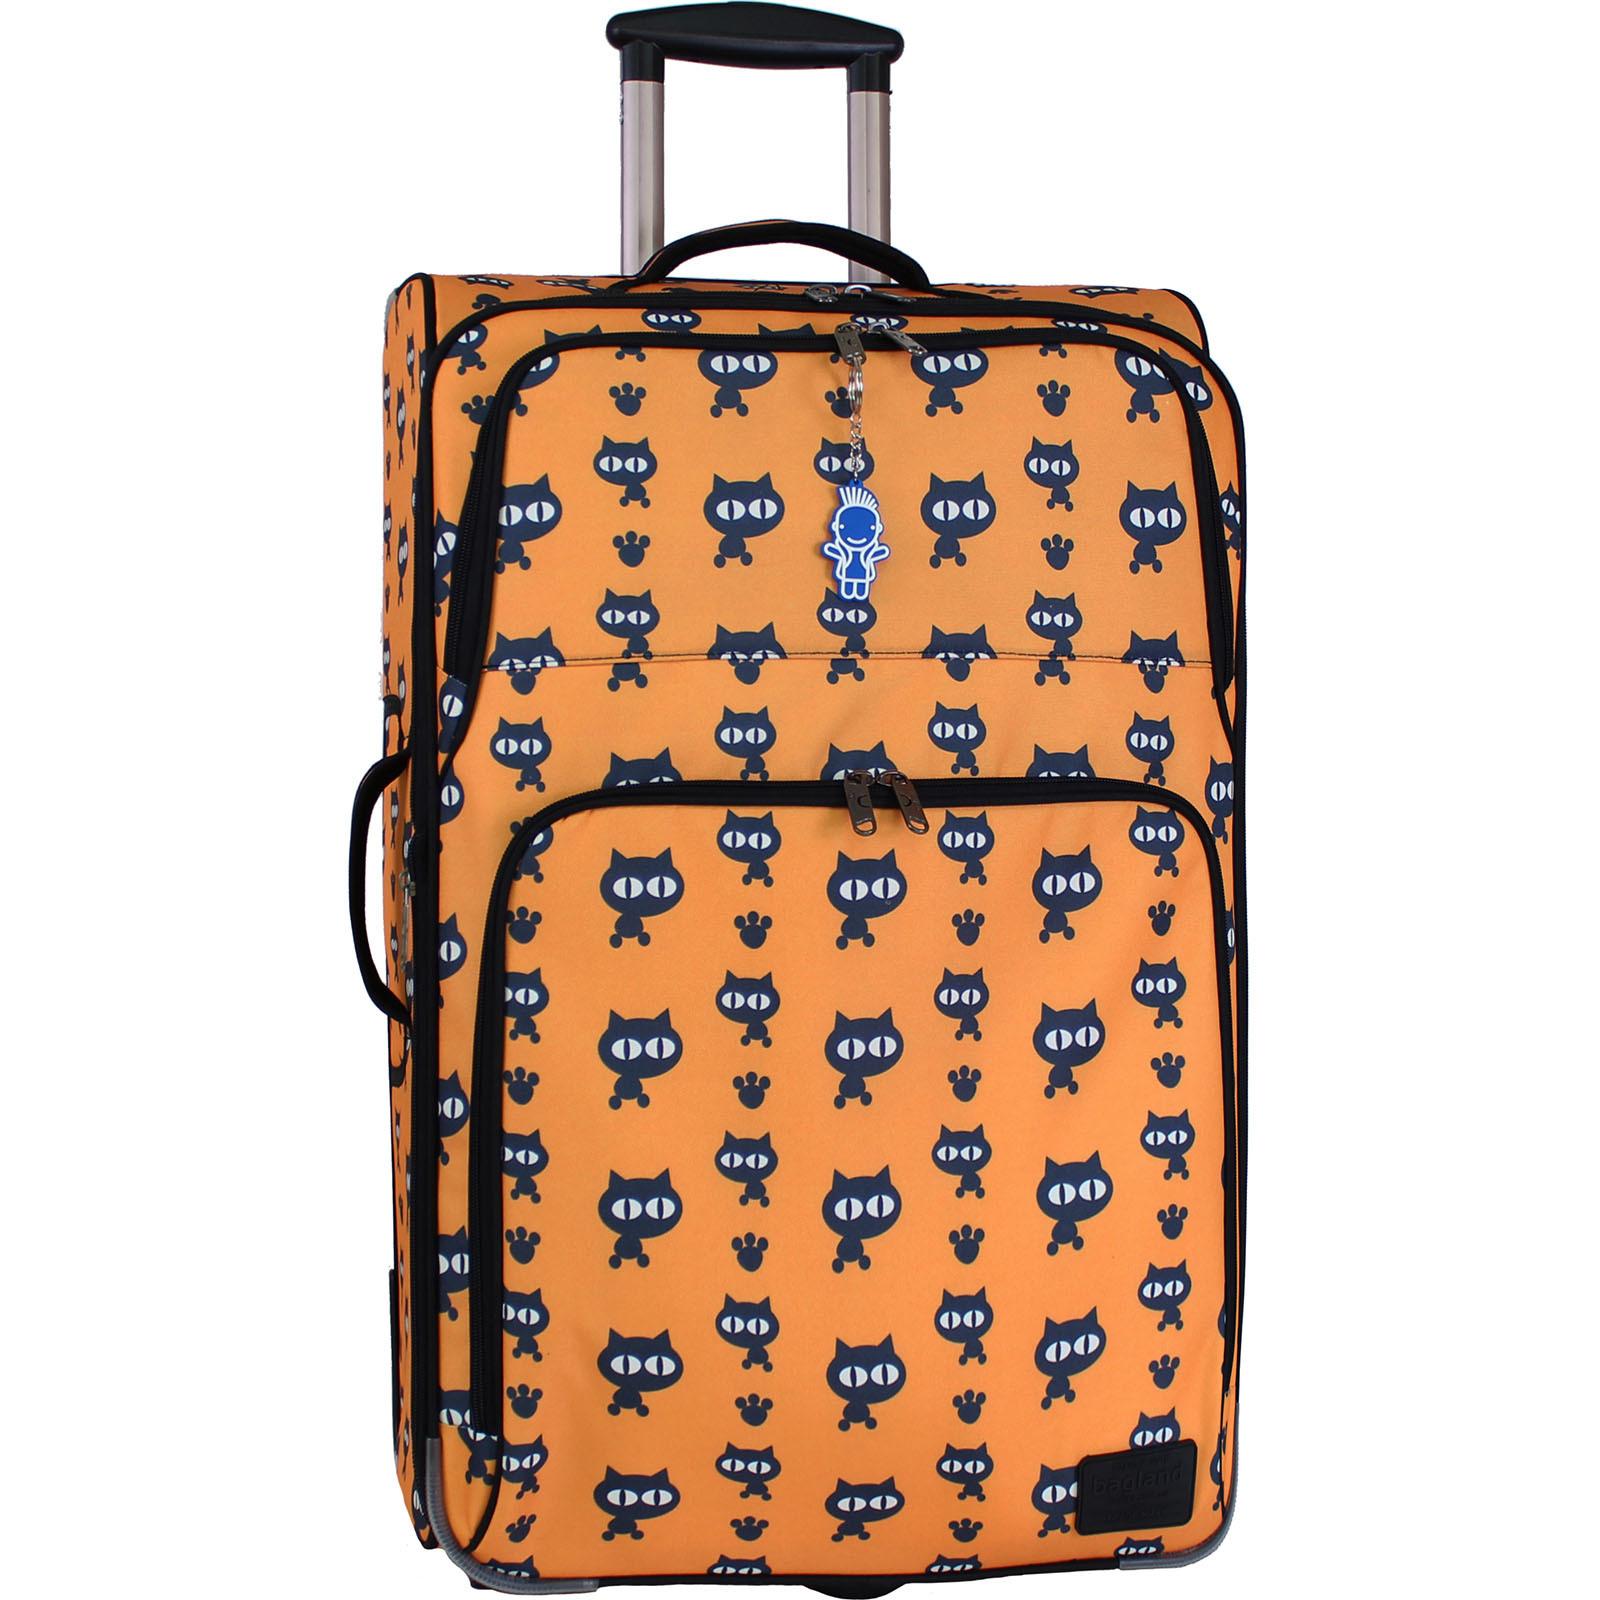 Дорожные чемоданы Чемодан Bagland Леон большой дизайн 70 л. сублімація 177 (0037666274) IMG_9833.JPG